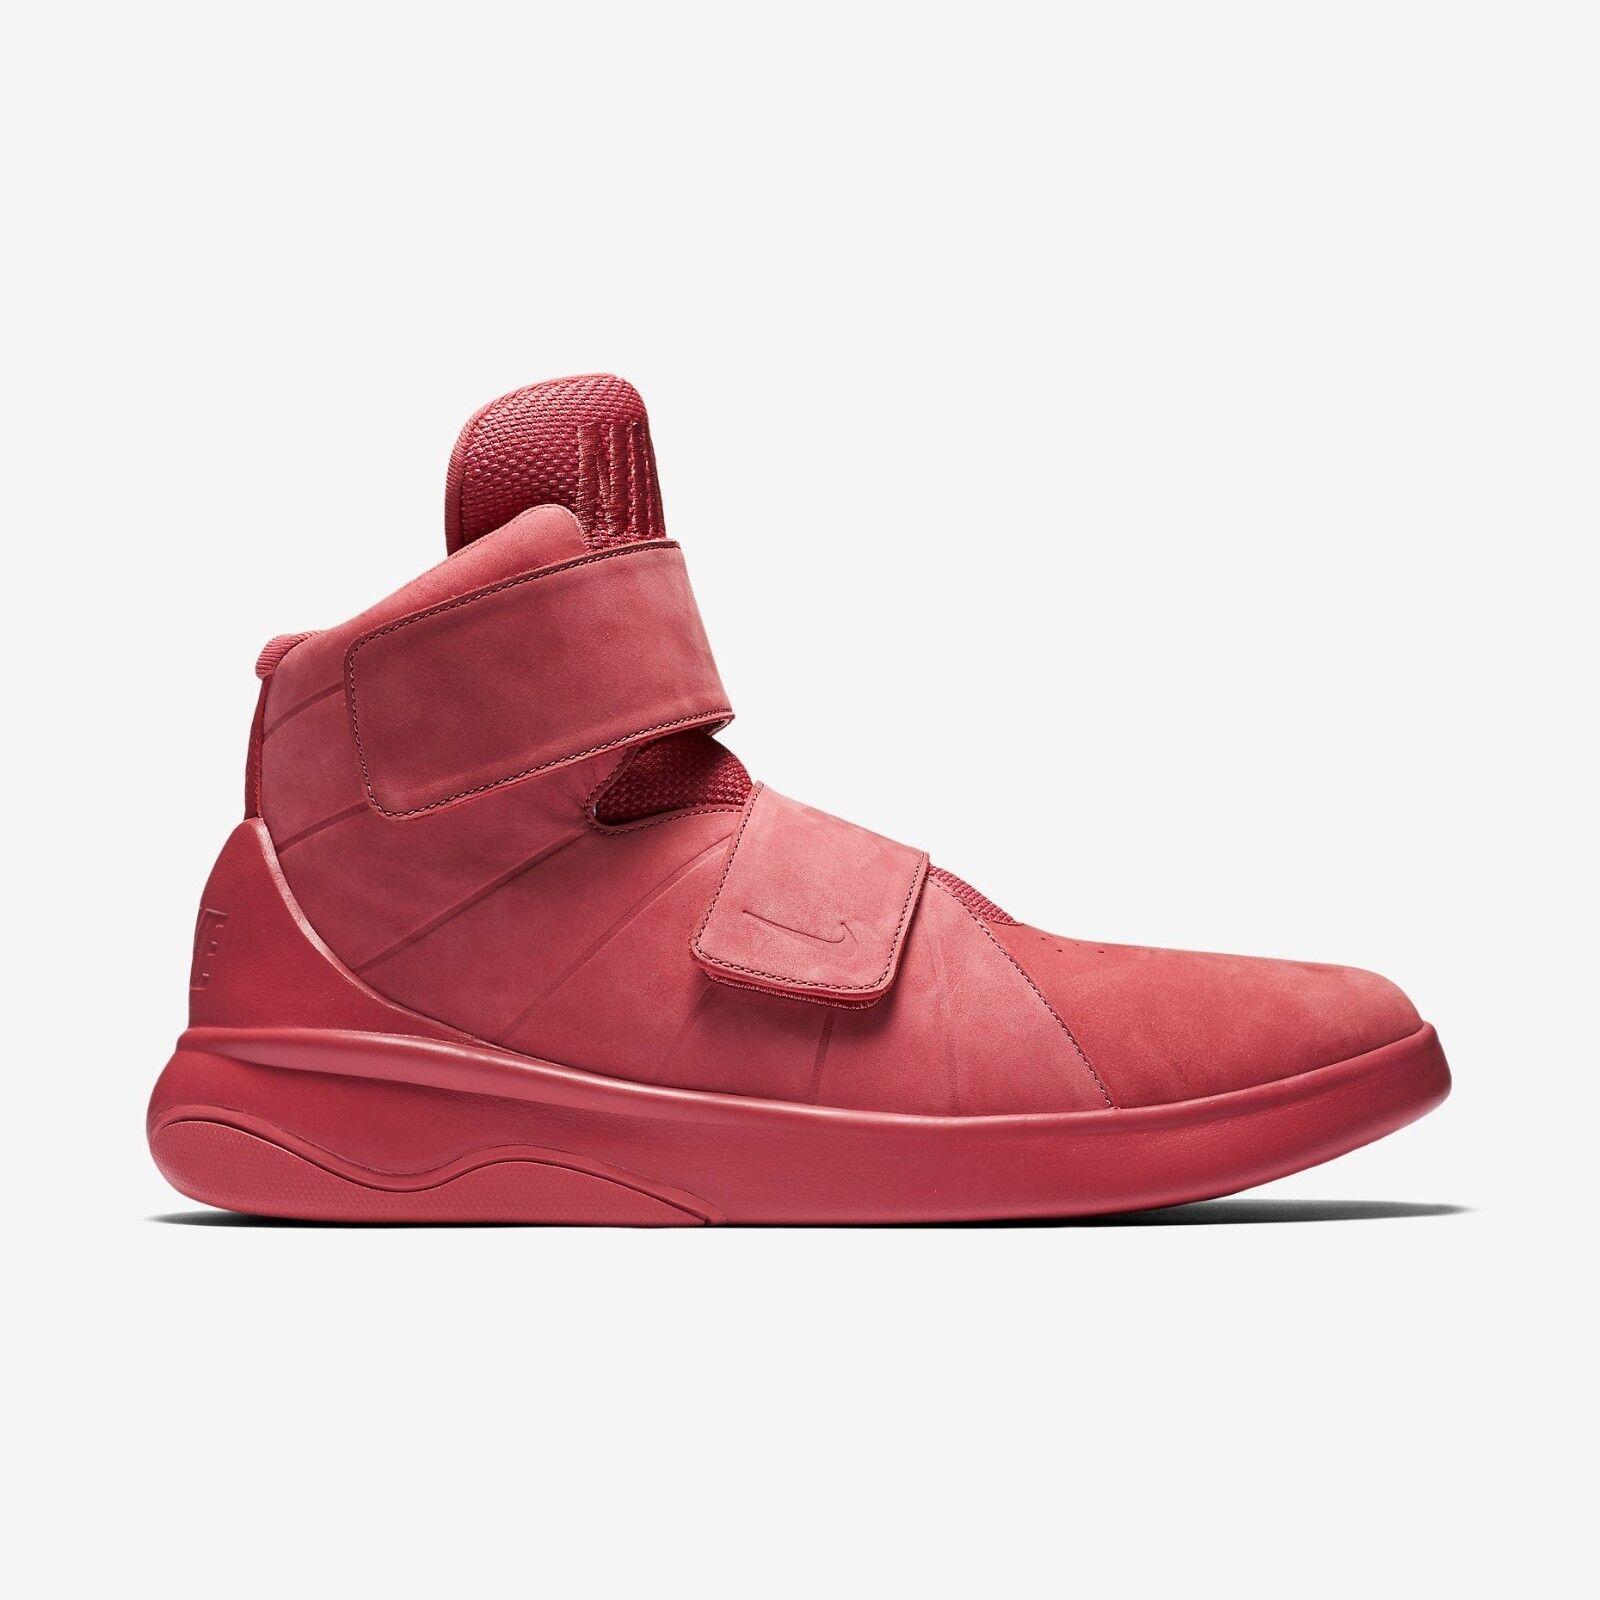 New Nike Men's Marxman Premium shoes (832766-600)  Terra Red Terra Red Terra Red